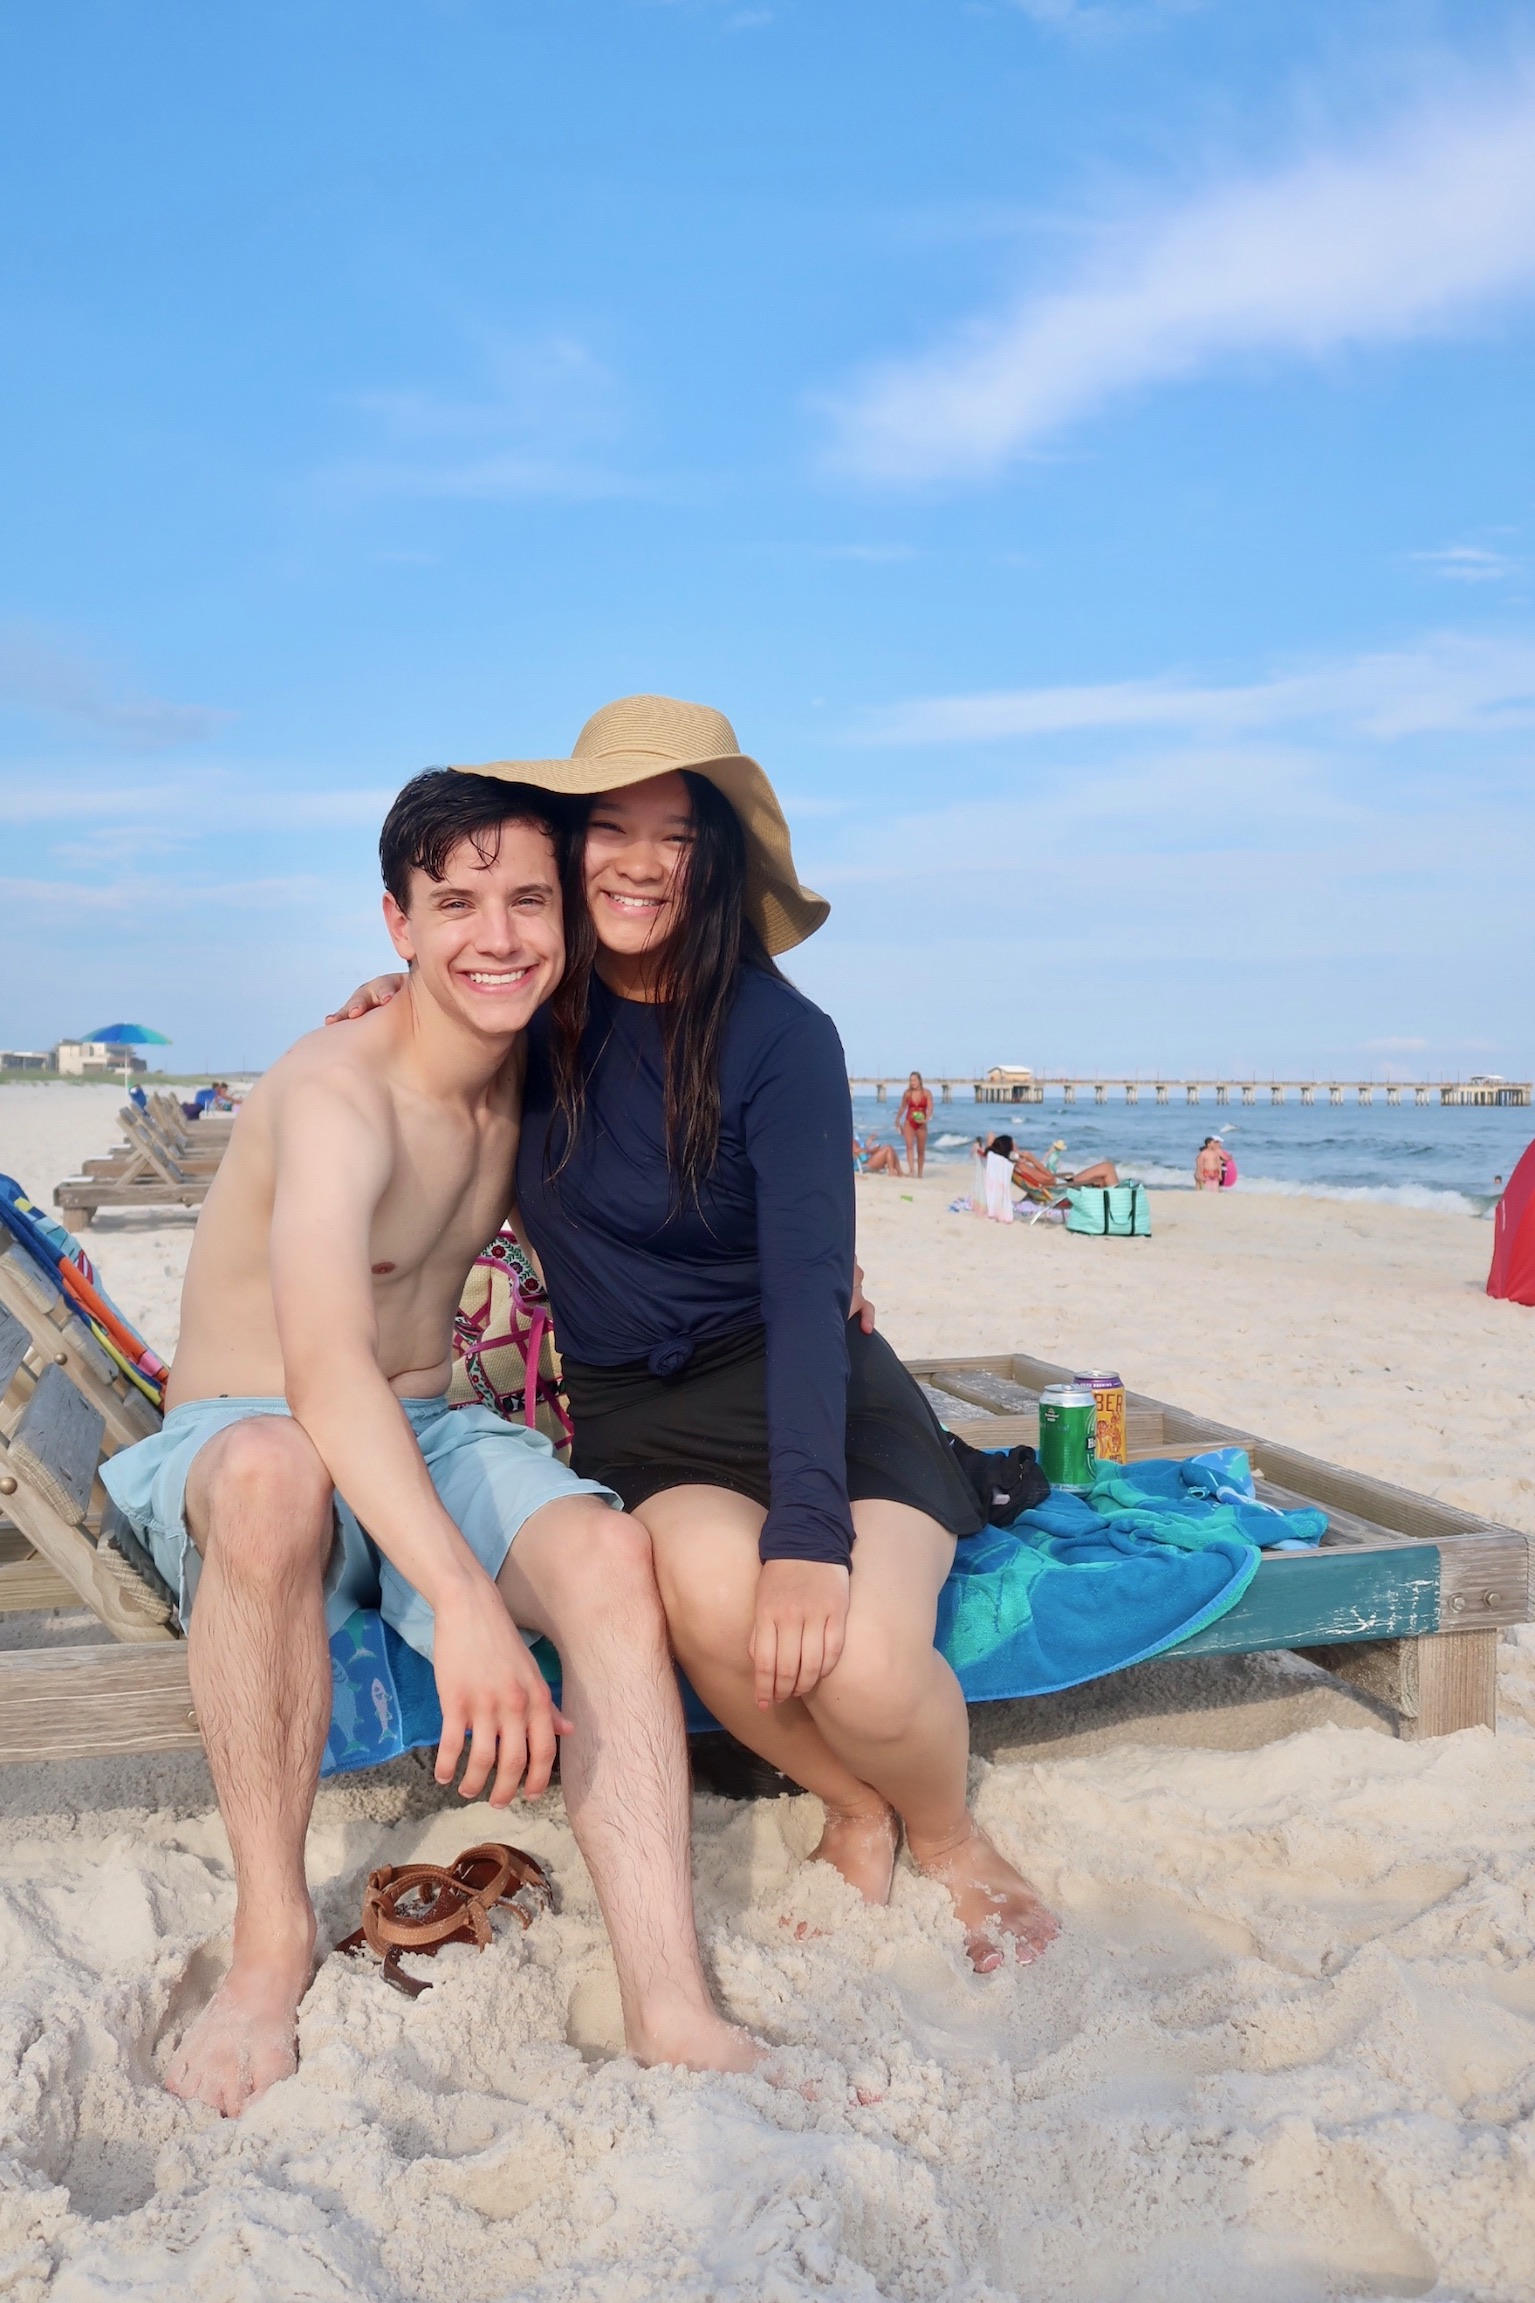 Joe and Flora lookin' super cute on the beach.